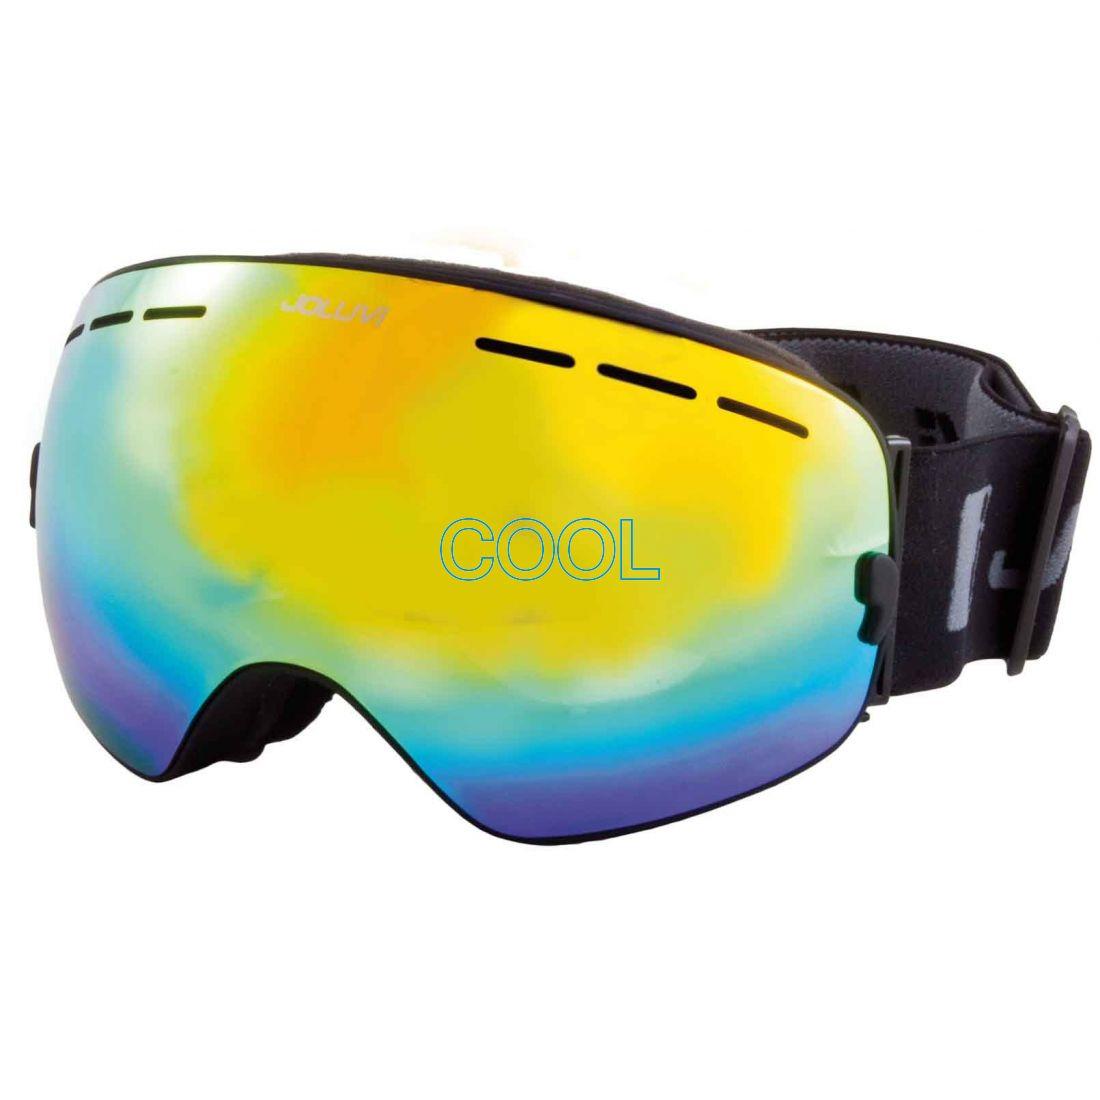 cool - Lyžovanie - Zrkadlové lyžiarske okuliare Joluvi FUTURA PRO 7b275710eb8